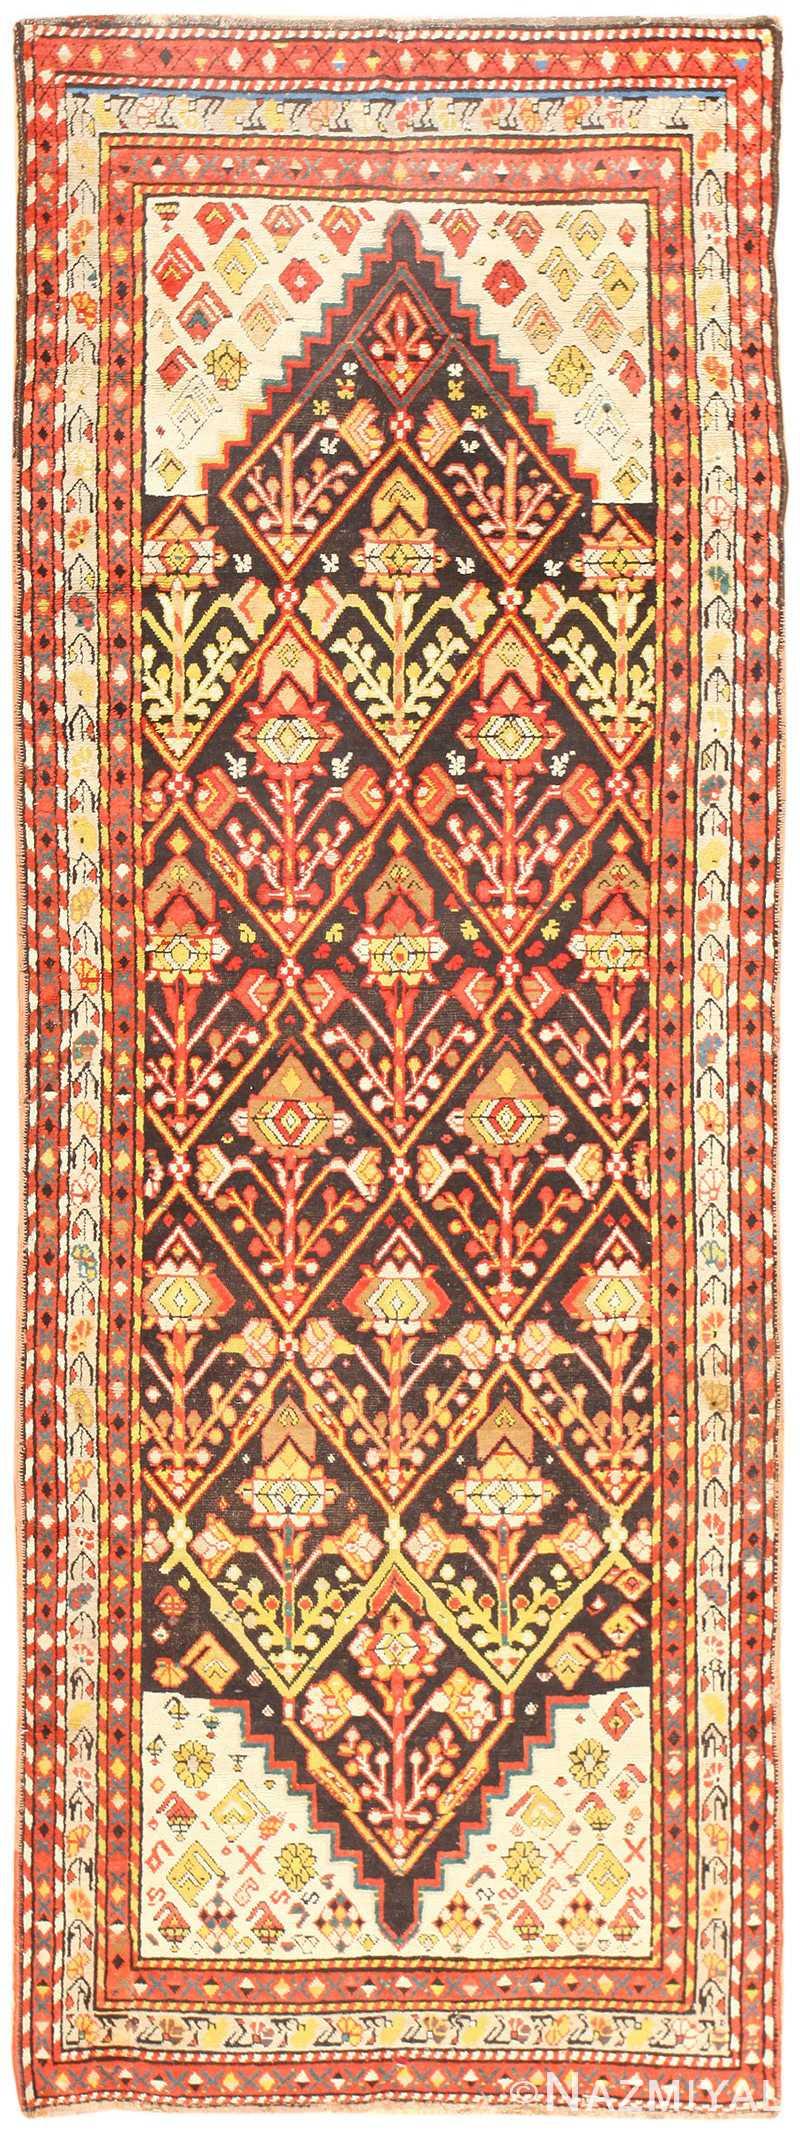 Antique Caucasian Kazak Rug 50424 Detail/Large View